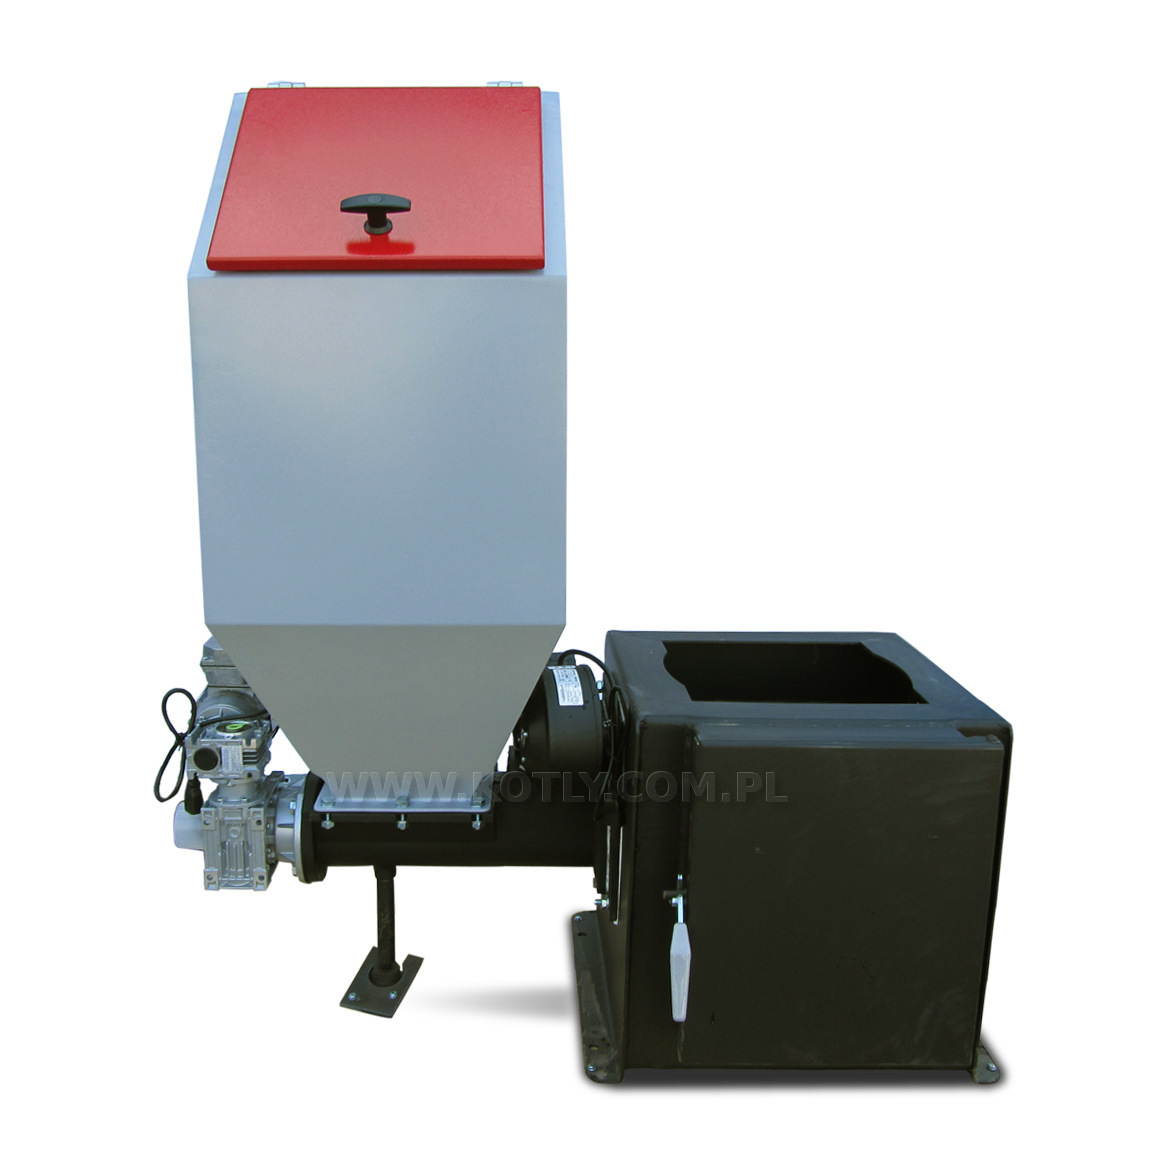 Conversion kit PROSAT 3 class for Viadrus U22, U26 and DAKON FB boiler - 4  segments